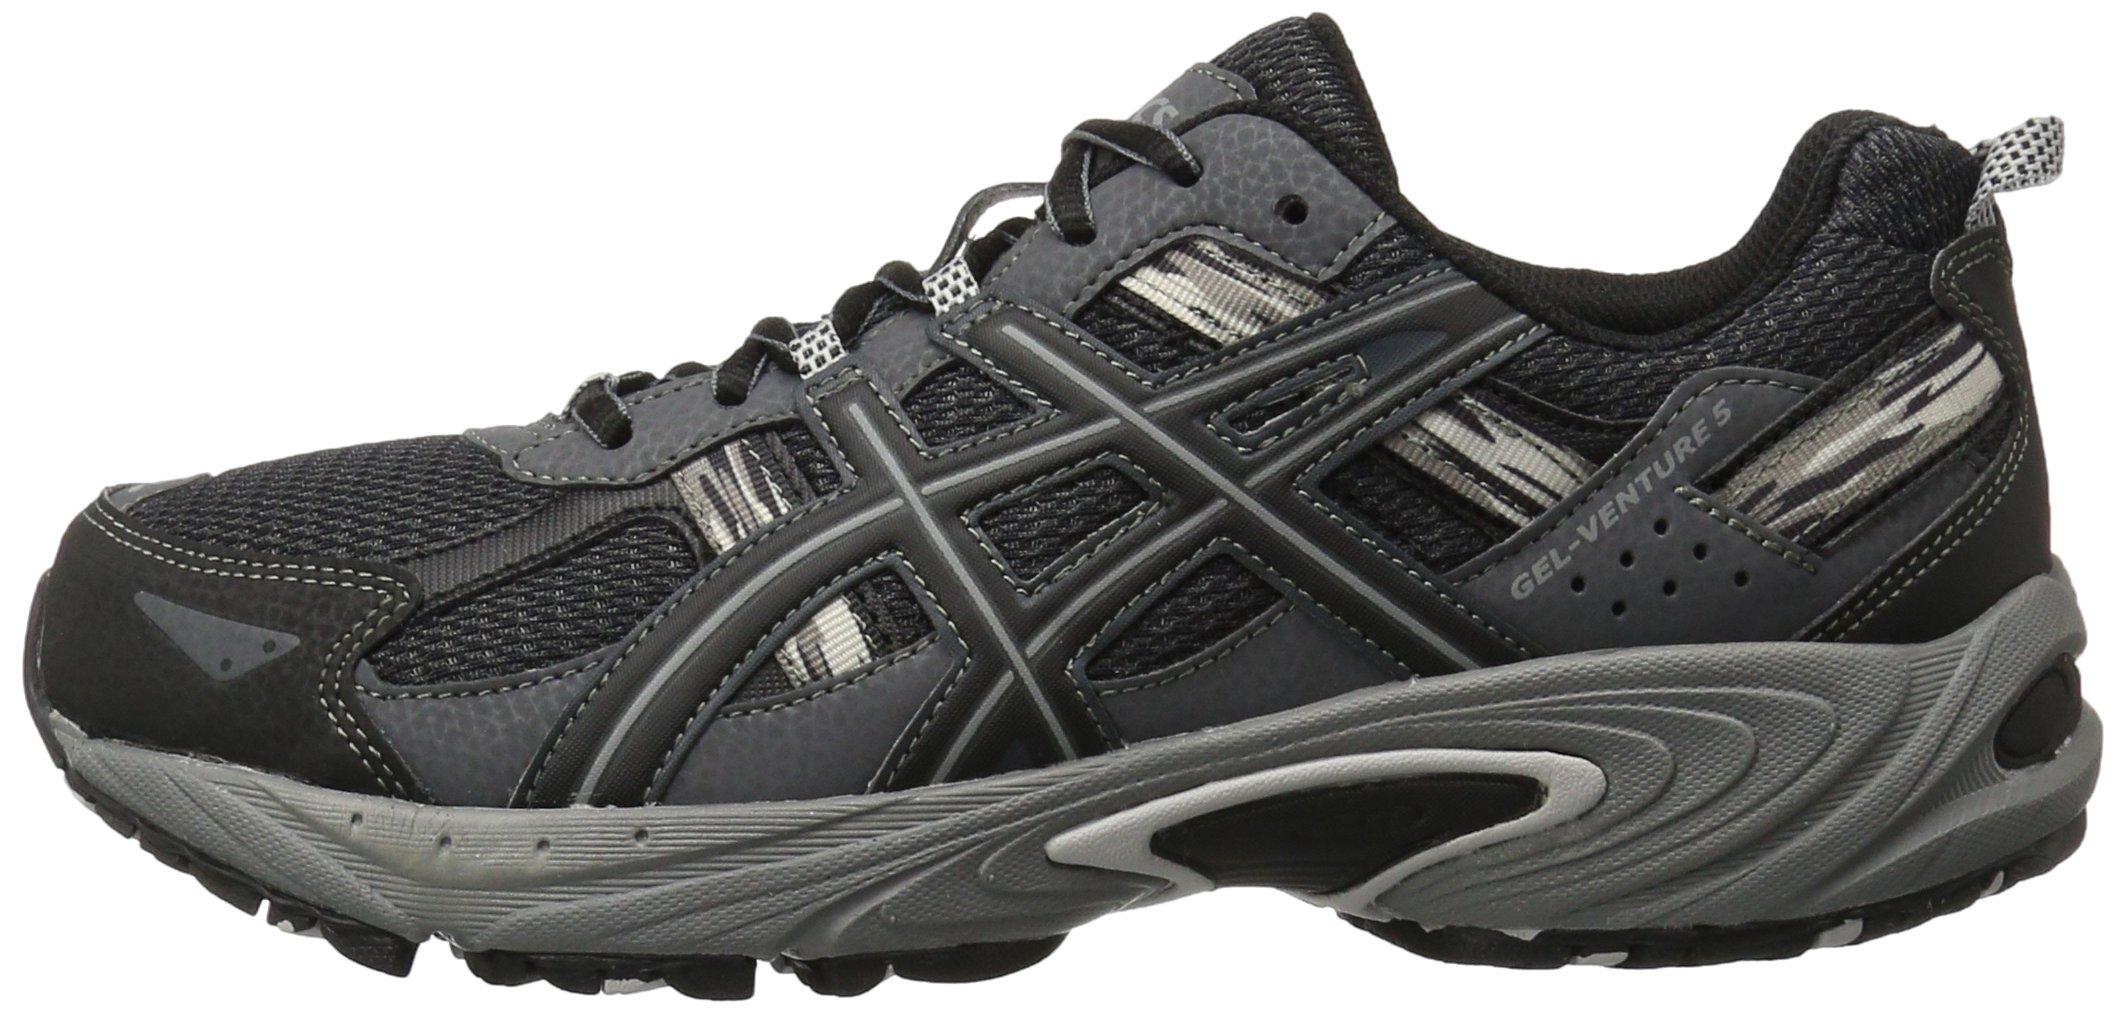 ASICS Men's Gel-Venture 5-M, Black/Onyx/Charcoal, 8 M US by ASICS (Image #5)